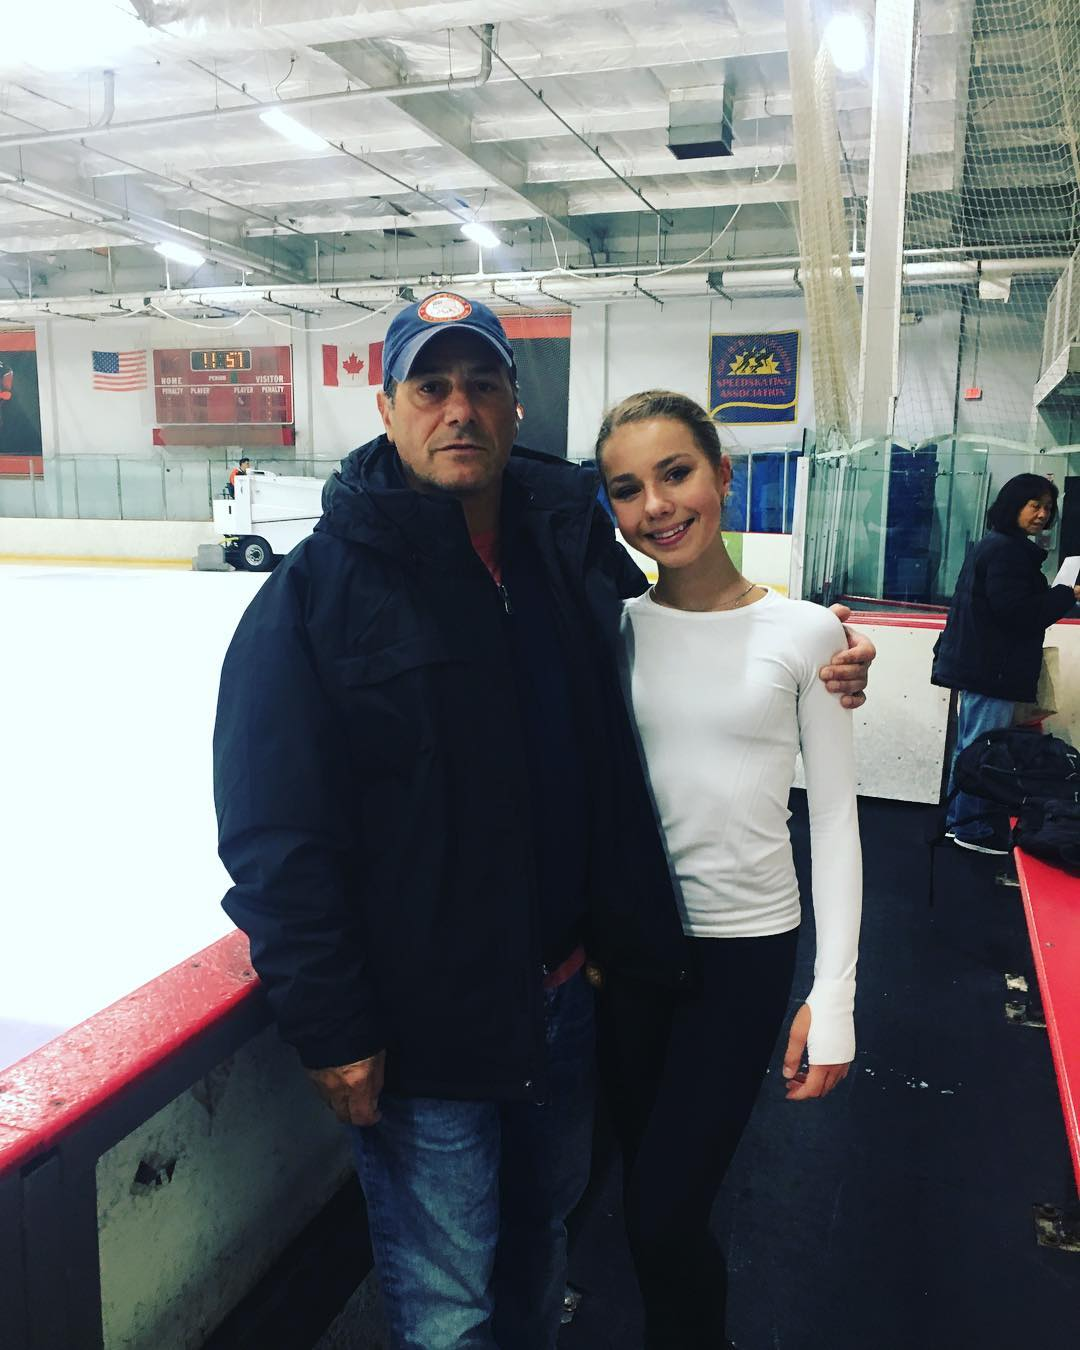 Рафаэль Арутюнян/тренер - Страница 2 17SUC2topFM